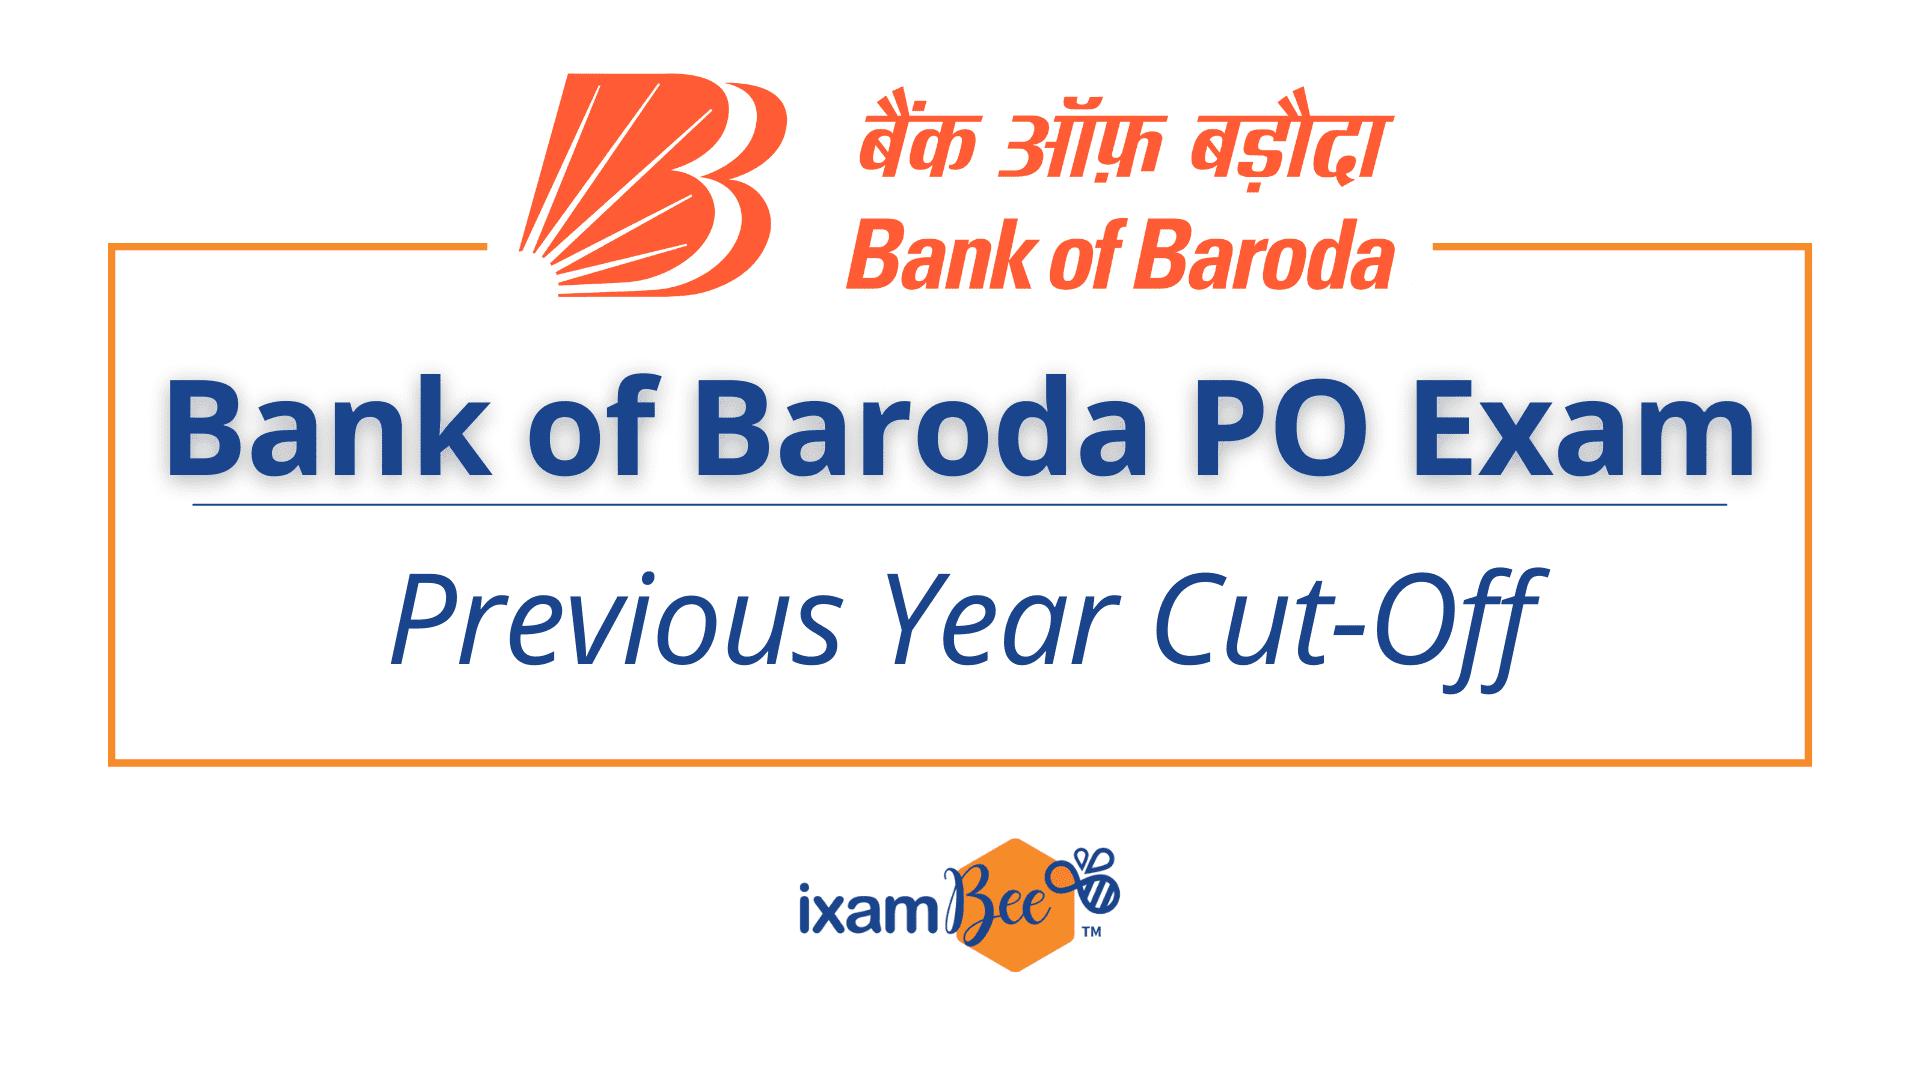 Bank of Baroda PO Exam Cut Off